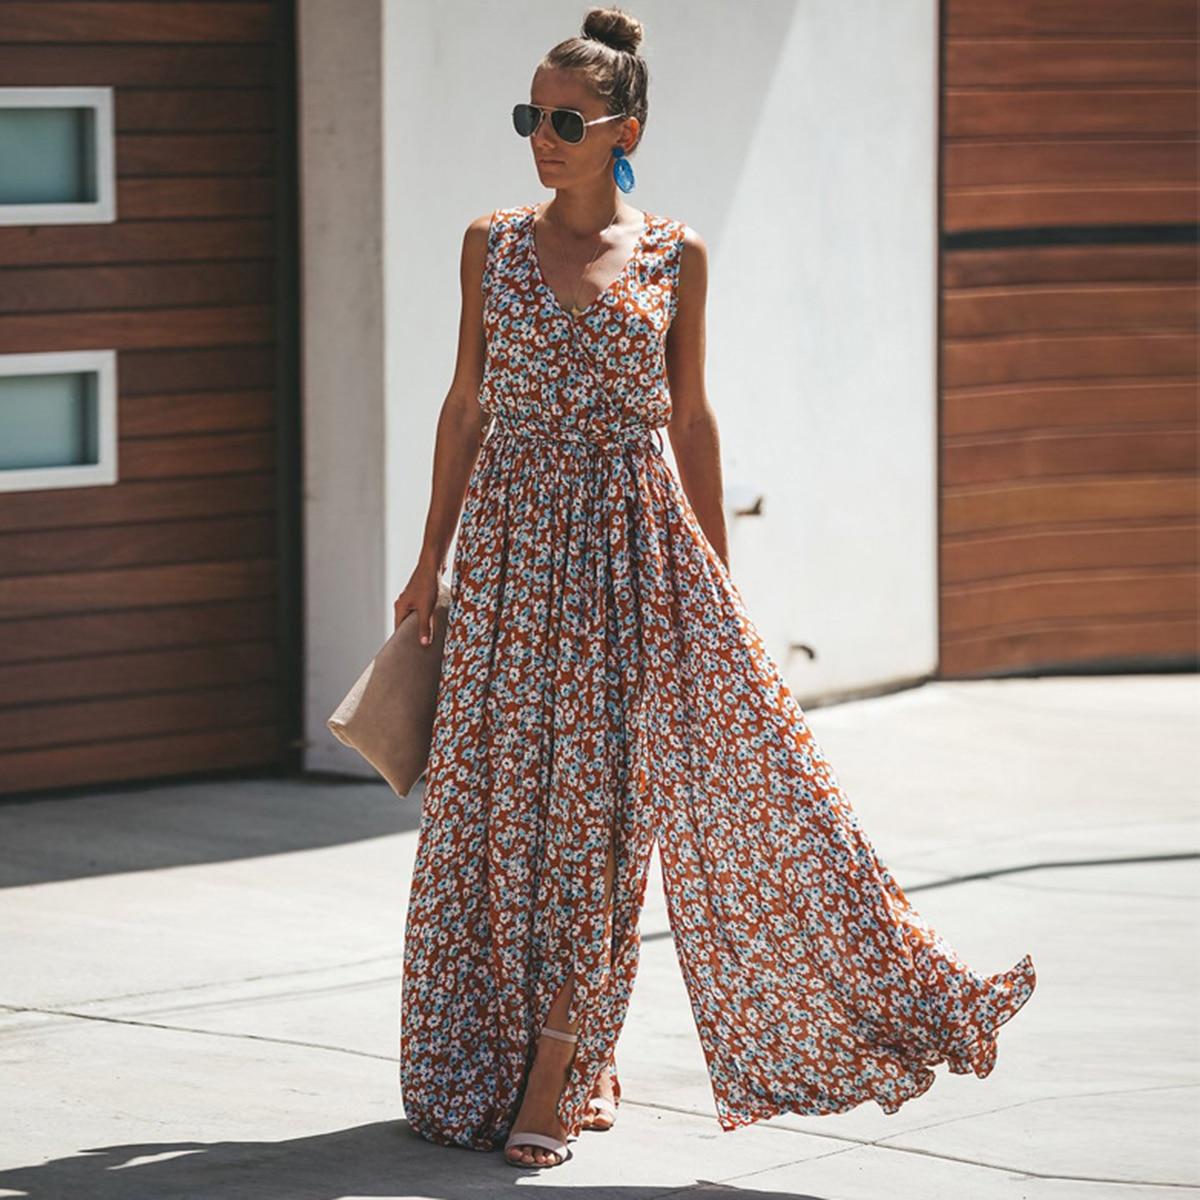 Jastie Women Summer Dress Floral Print Maxi Dresses Bohemian Hippie Beach Long Dress Women's Clothing 2021 vestidos de verano